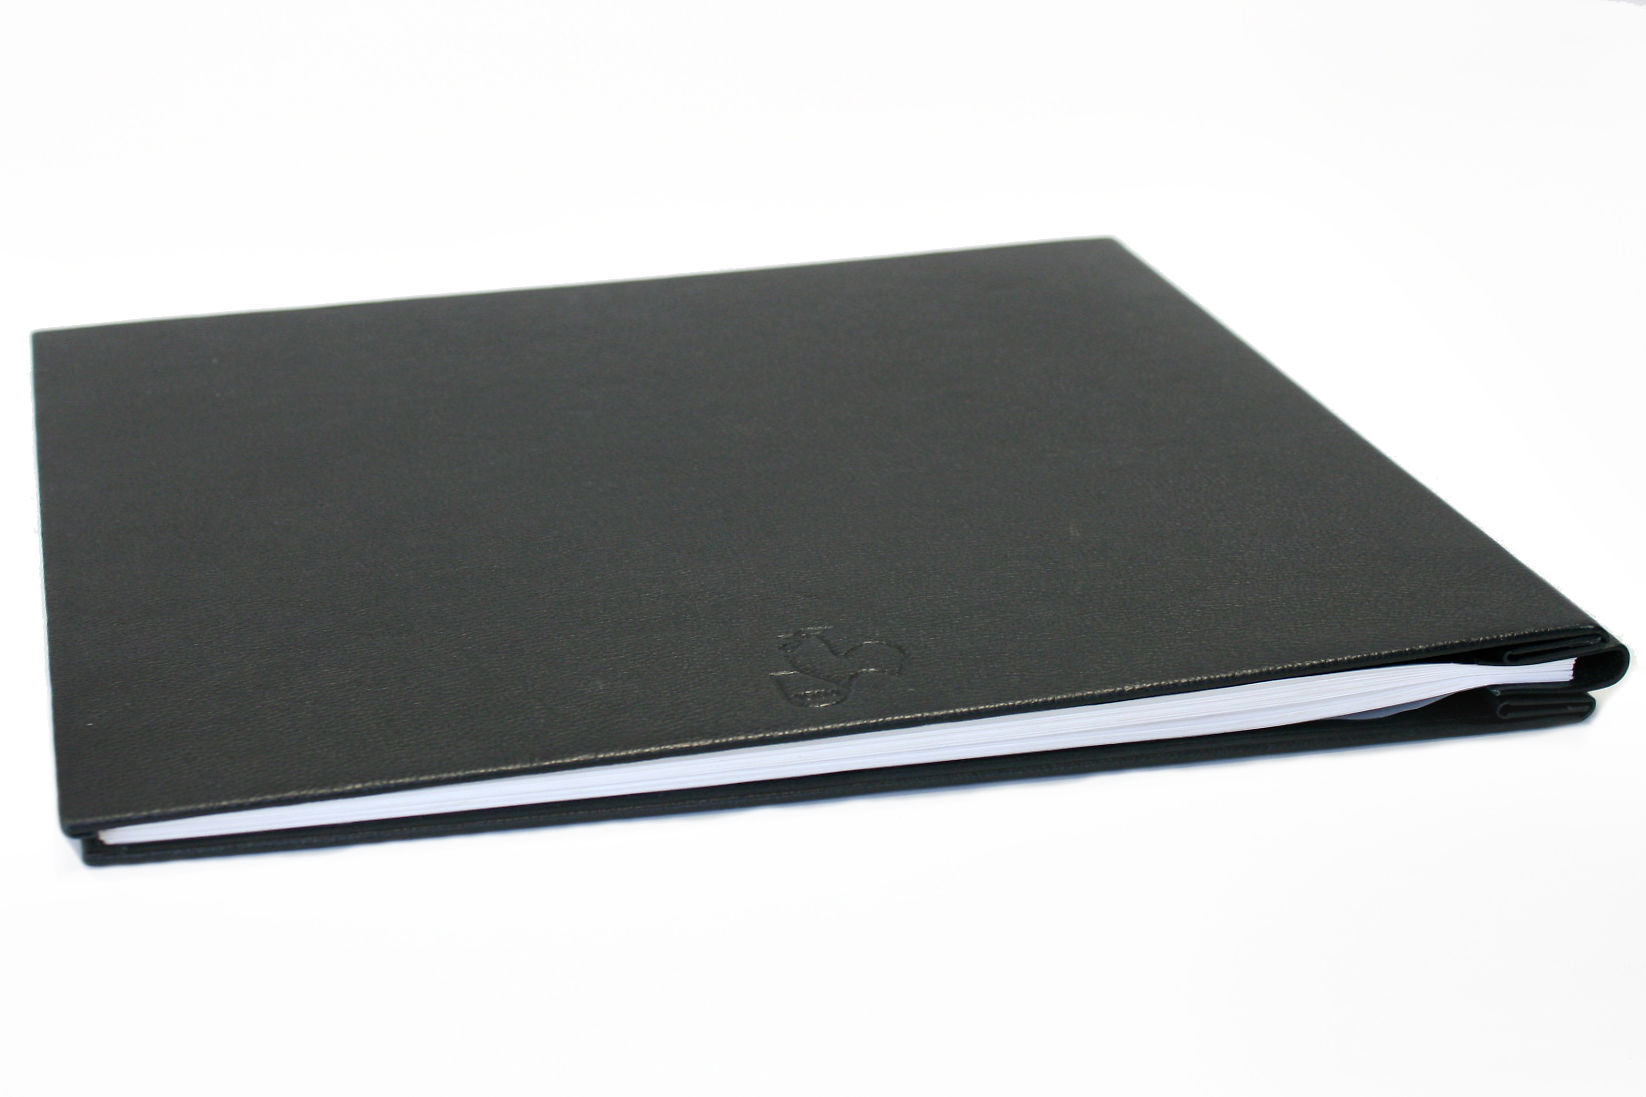 Hahnemühle Leather Inkjet A4 Album Image